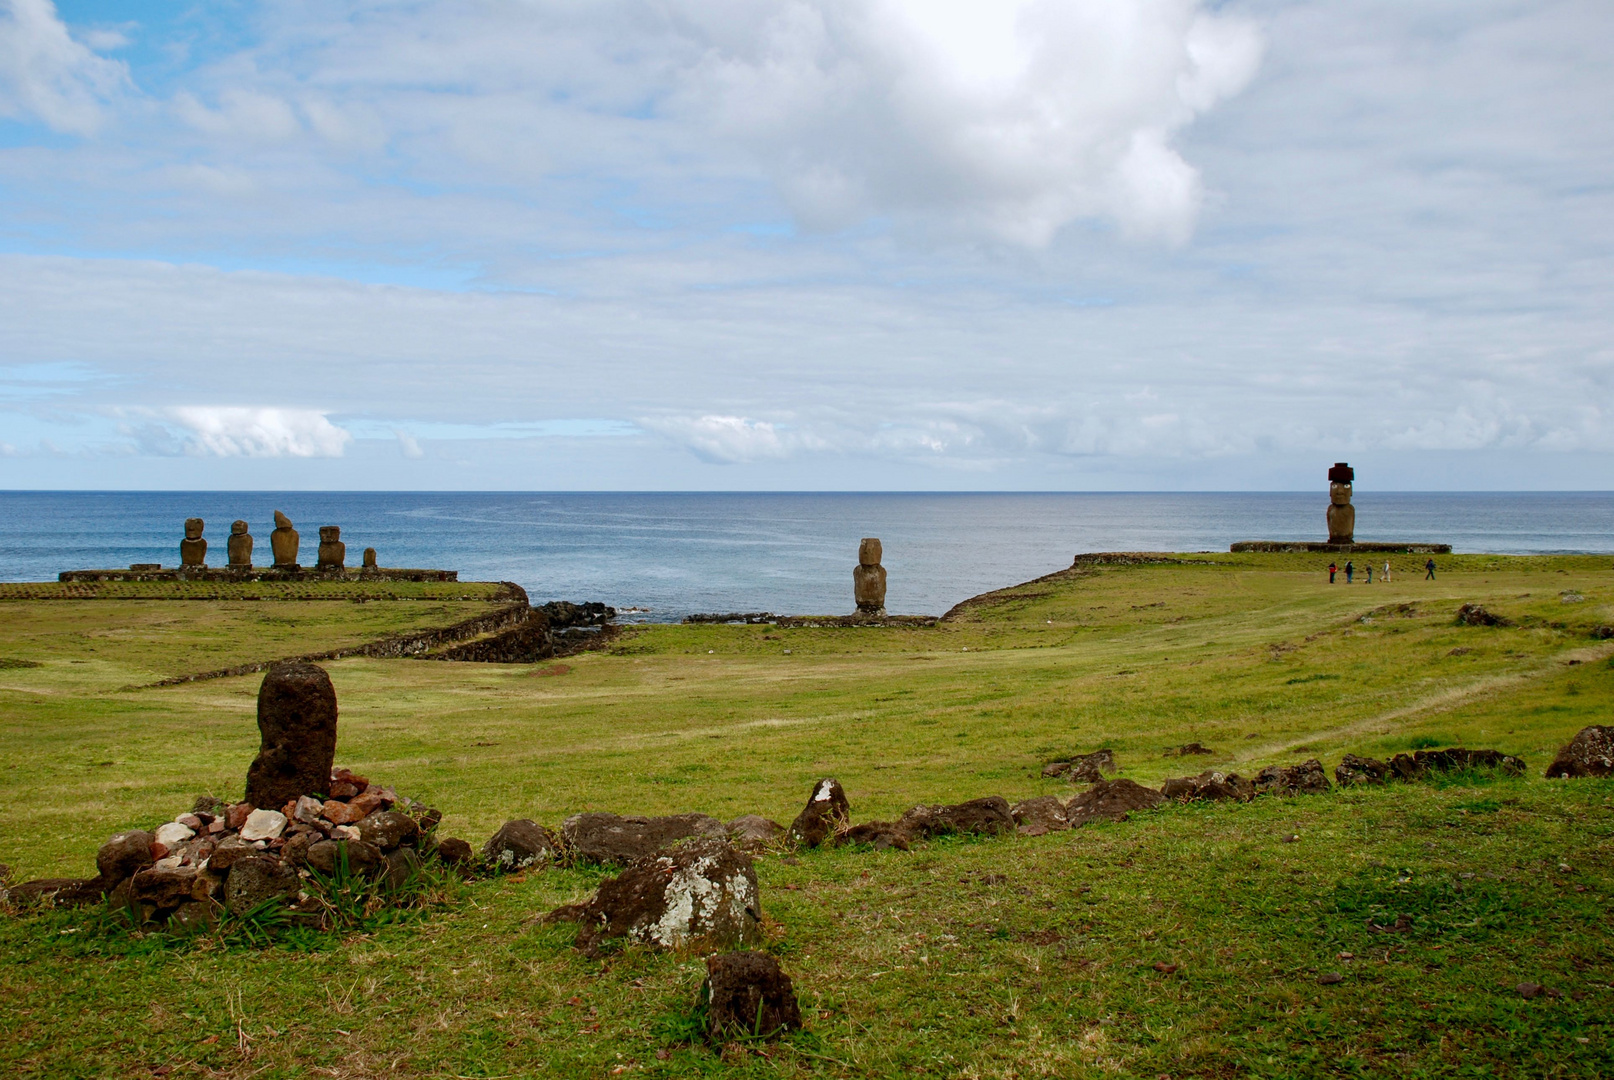 Ahu Tahai - Isola di Pasqua 1